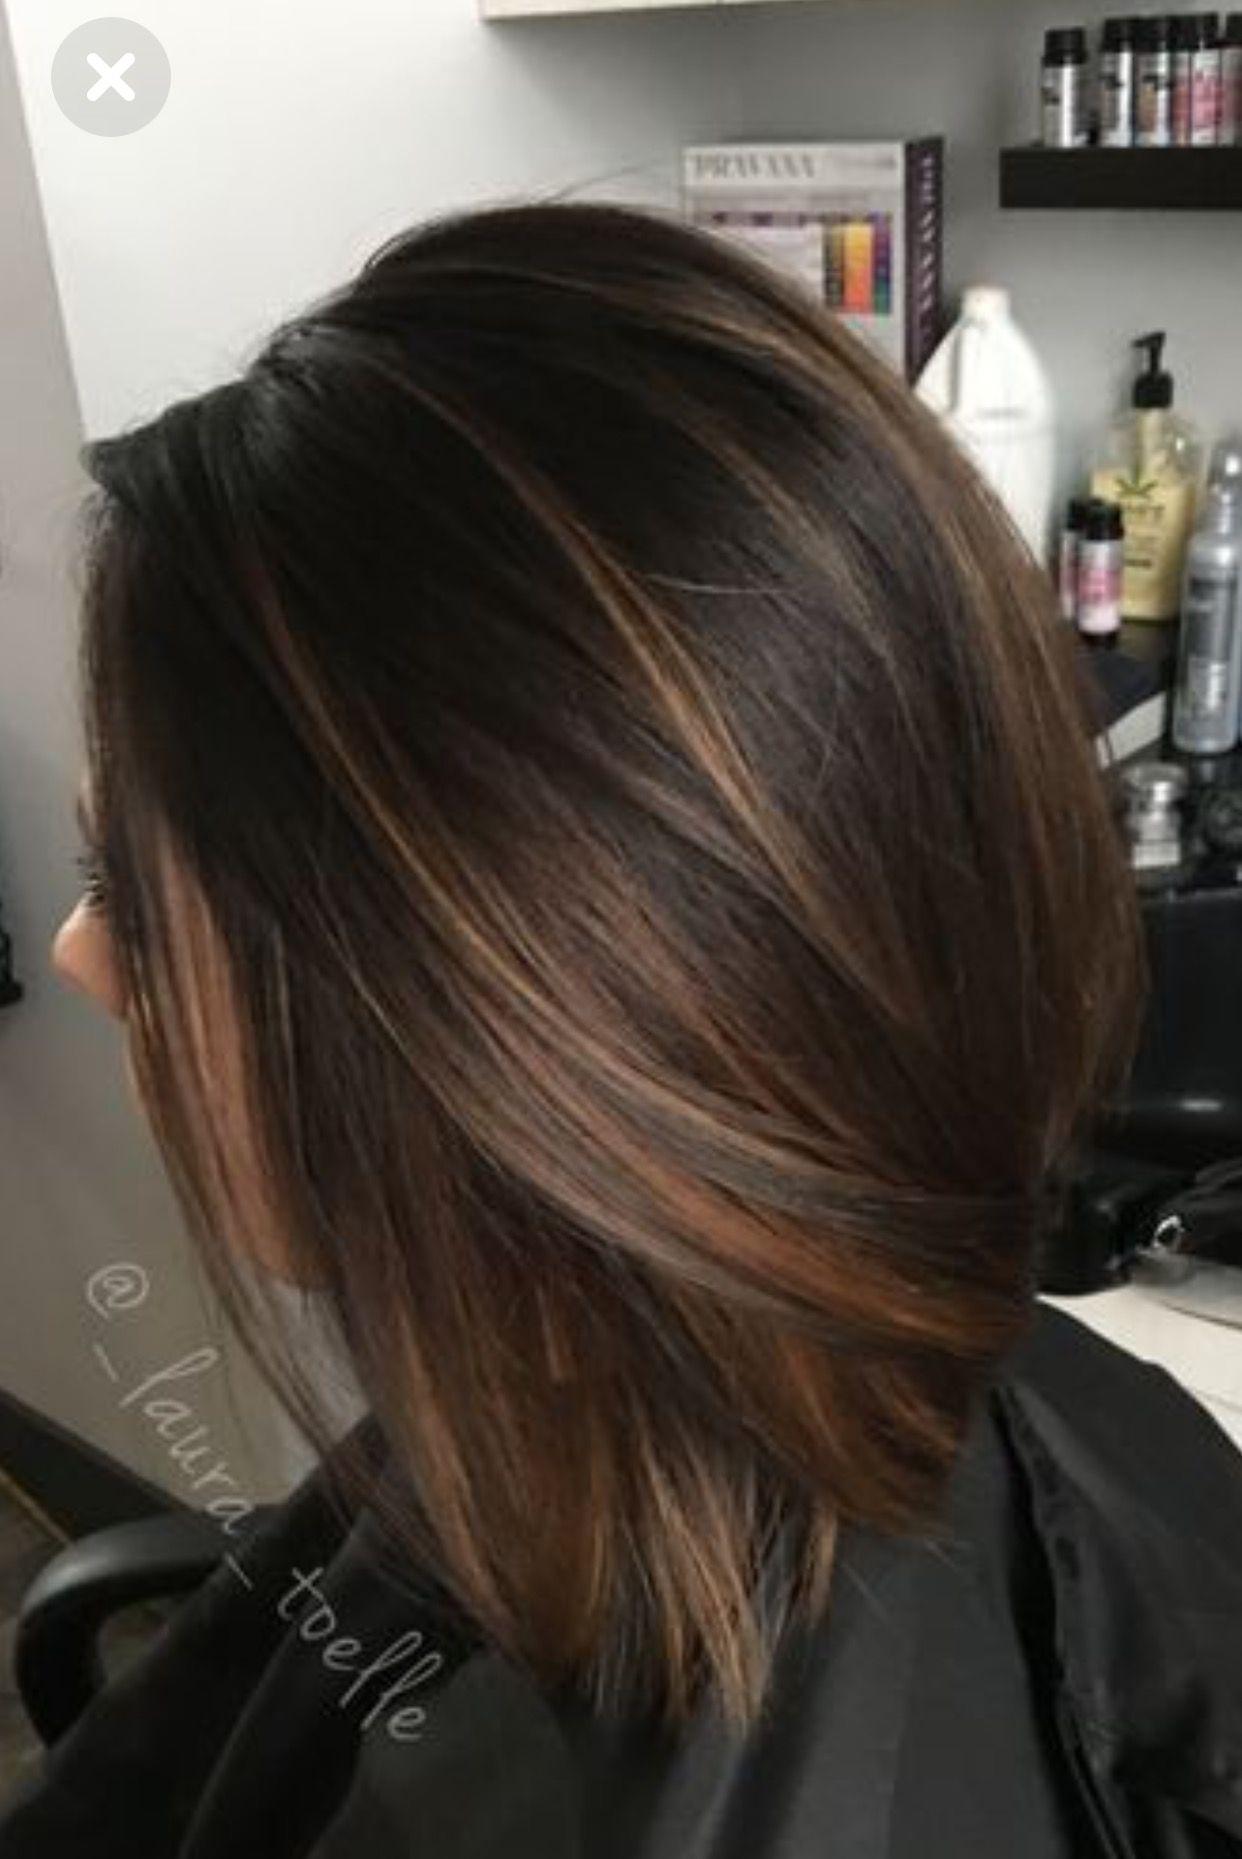 Pin By Christina Hanna On Beauty Ideas Hair Styles Hair Color Brown Hair With Highlights